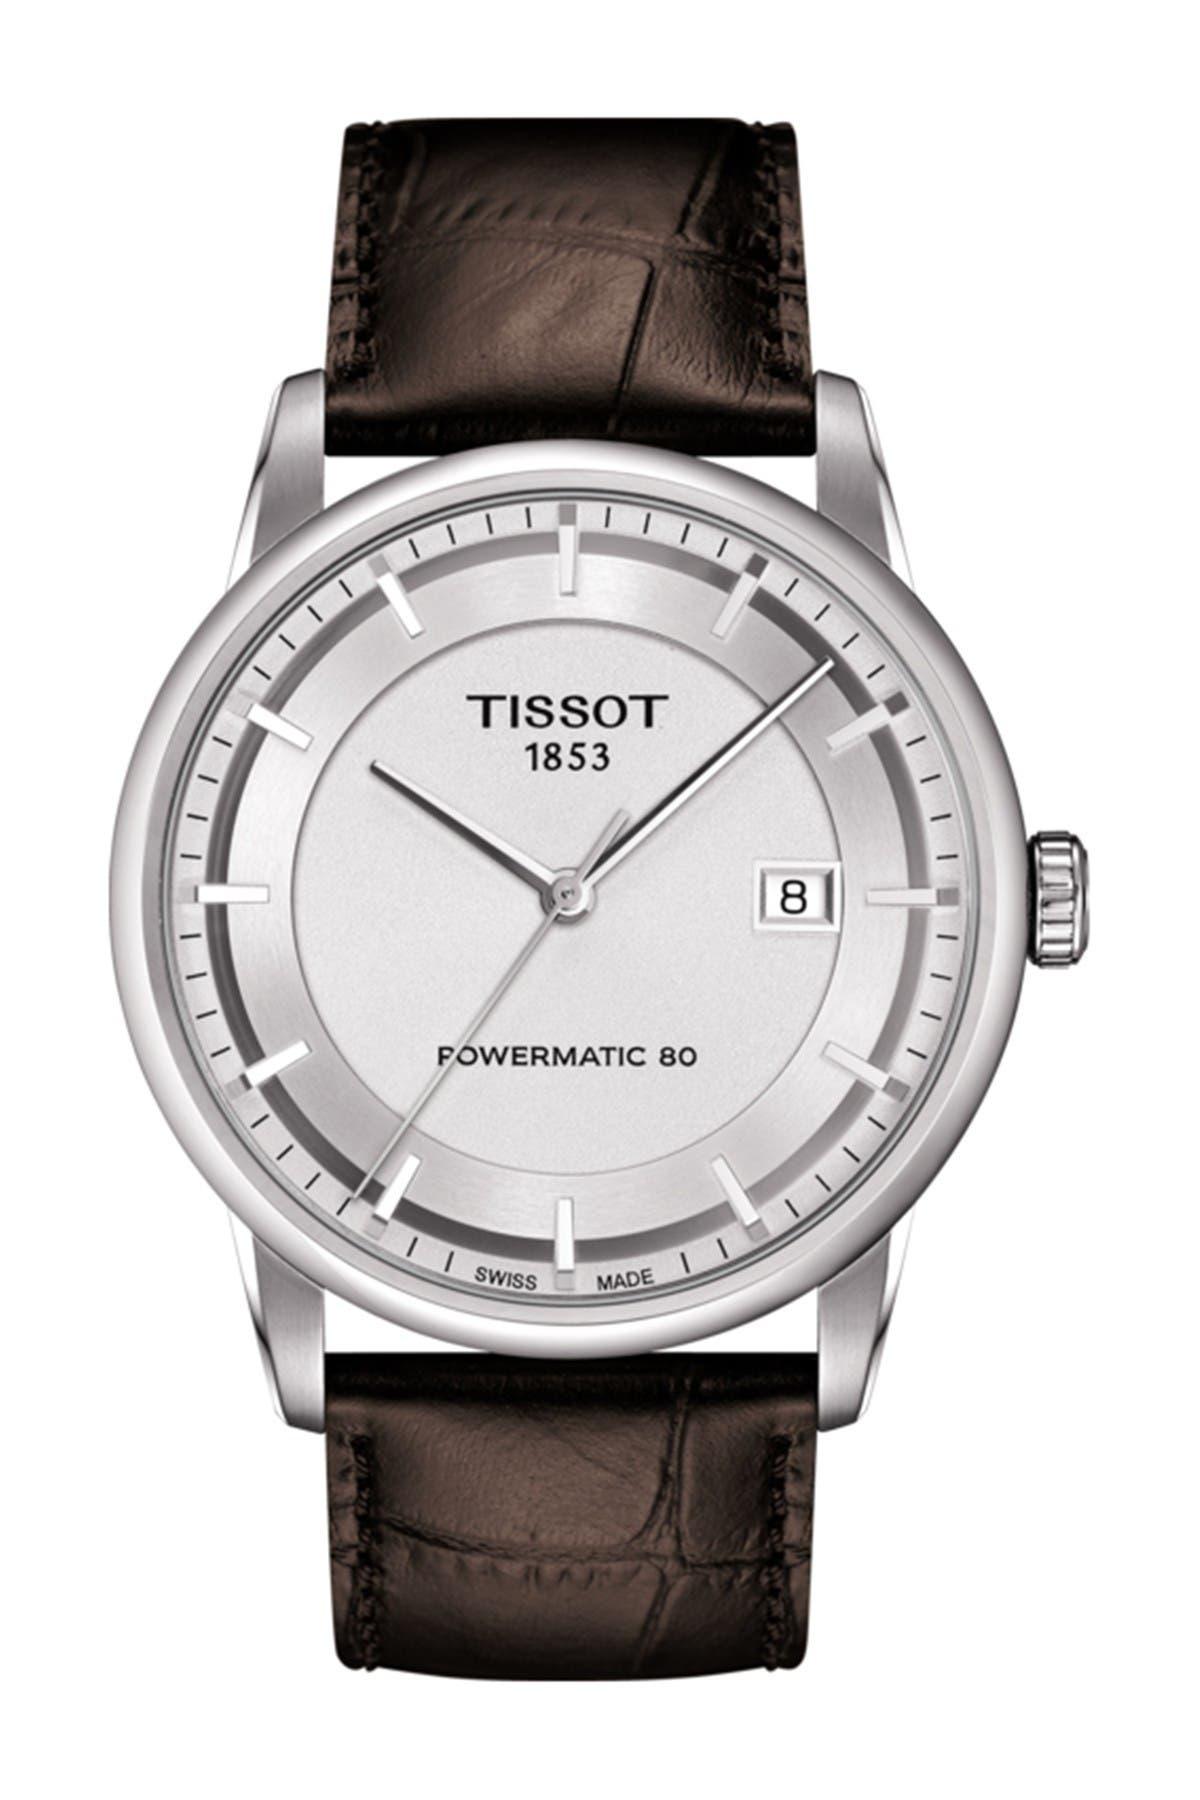 Image of Tissot Men's Luxury Powermatic 80 Croc Embossed Men's Leather Strap Watch, 41mm